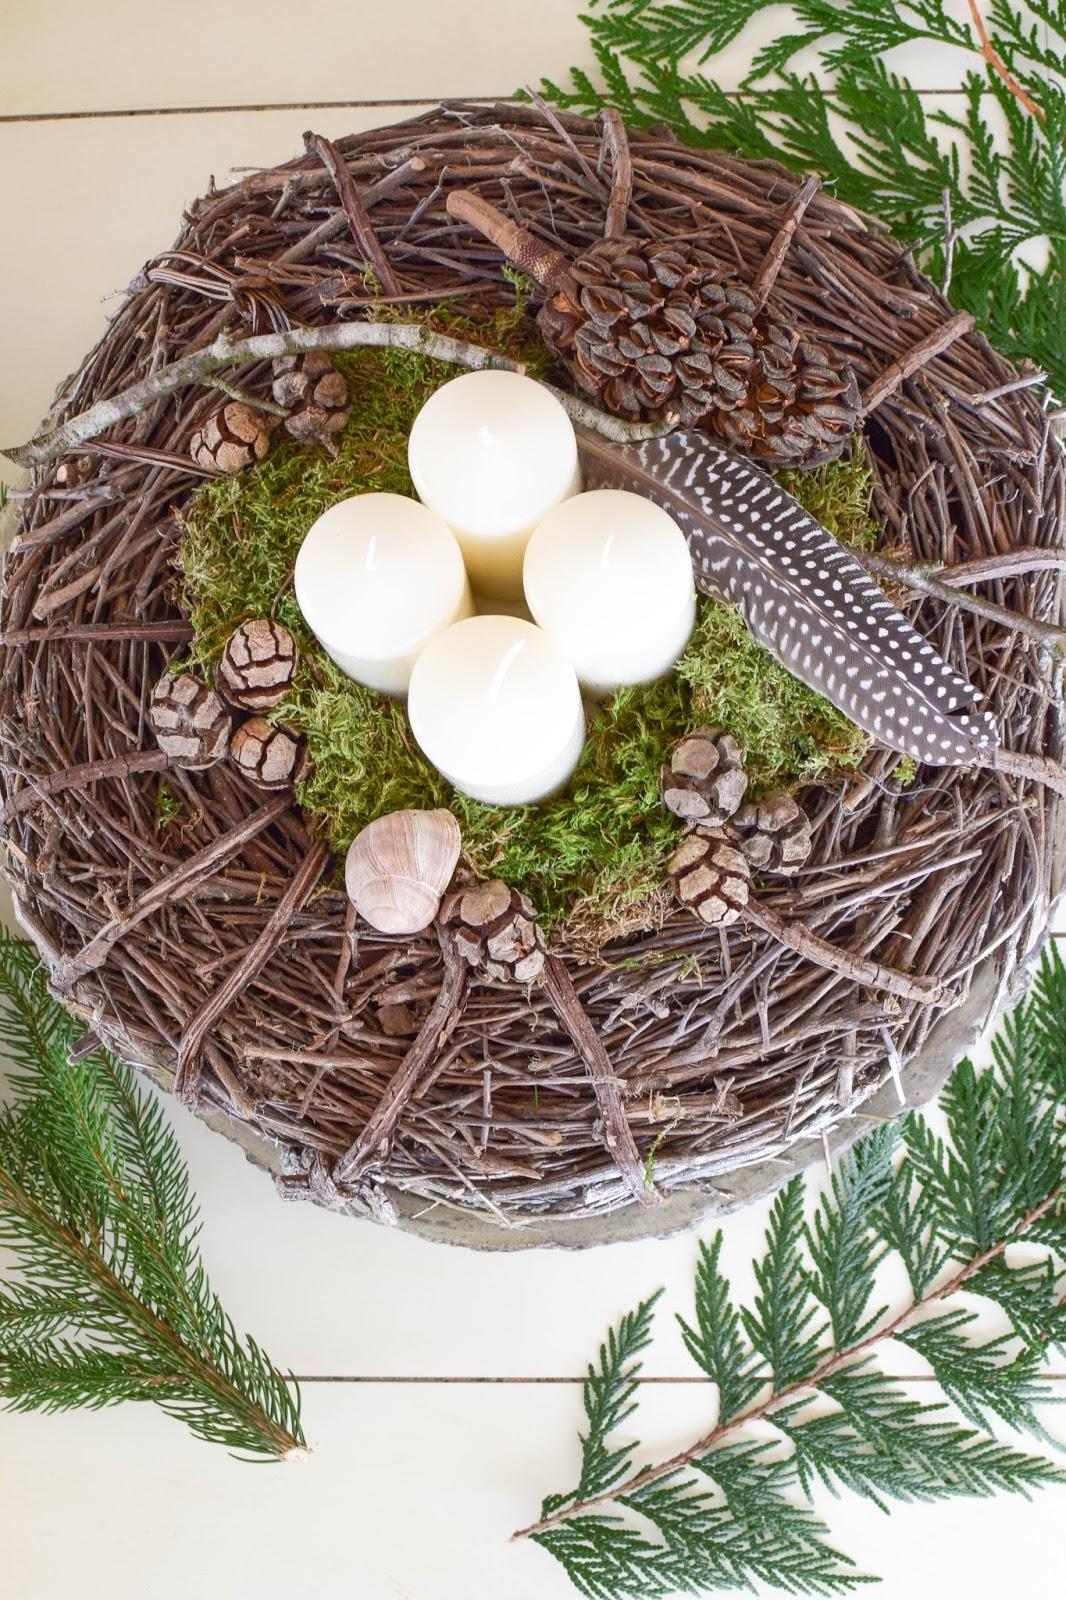 Ikea Varde Attityd Minikuche Tischdeko Advent Ideen Gt